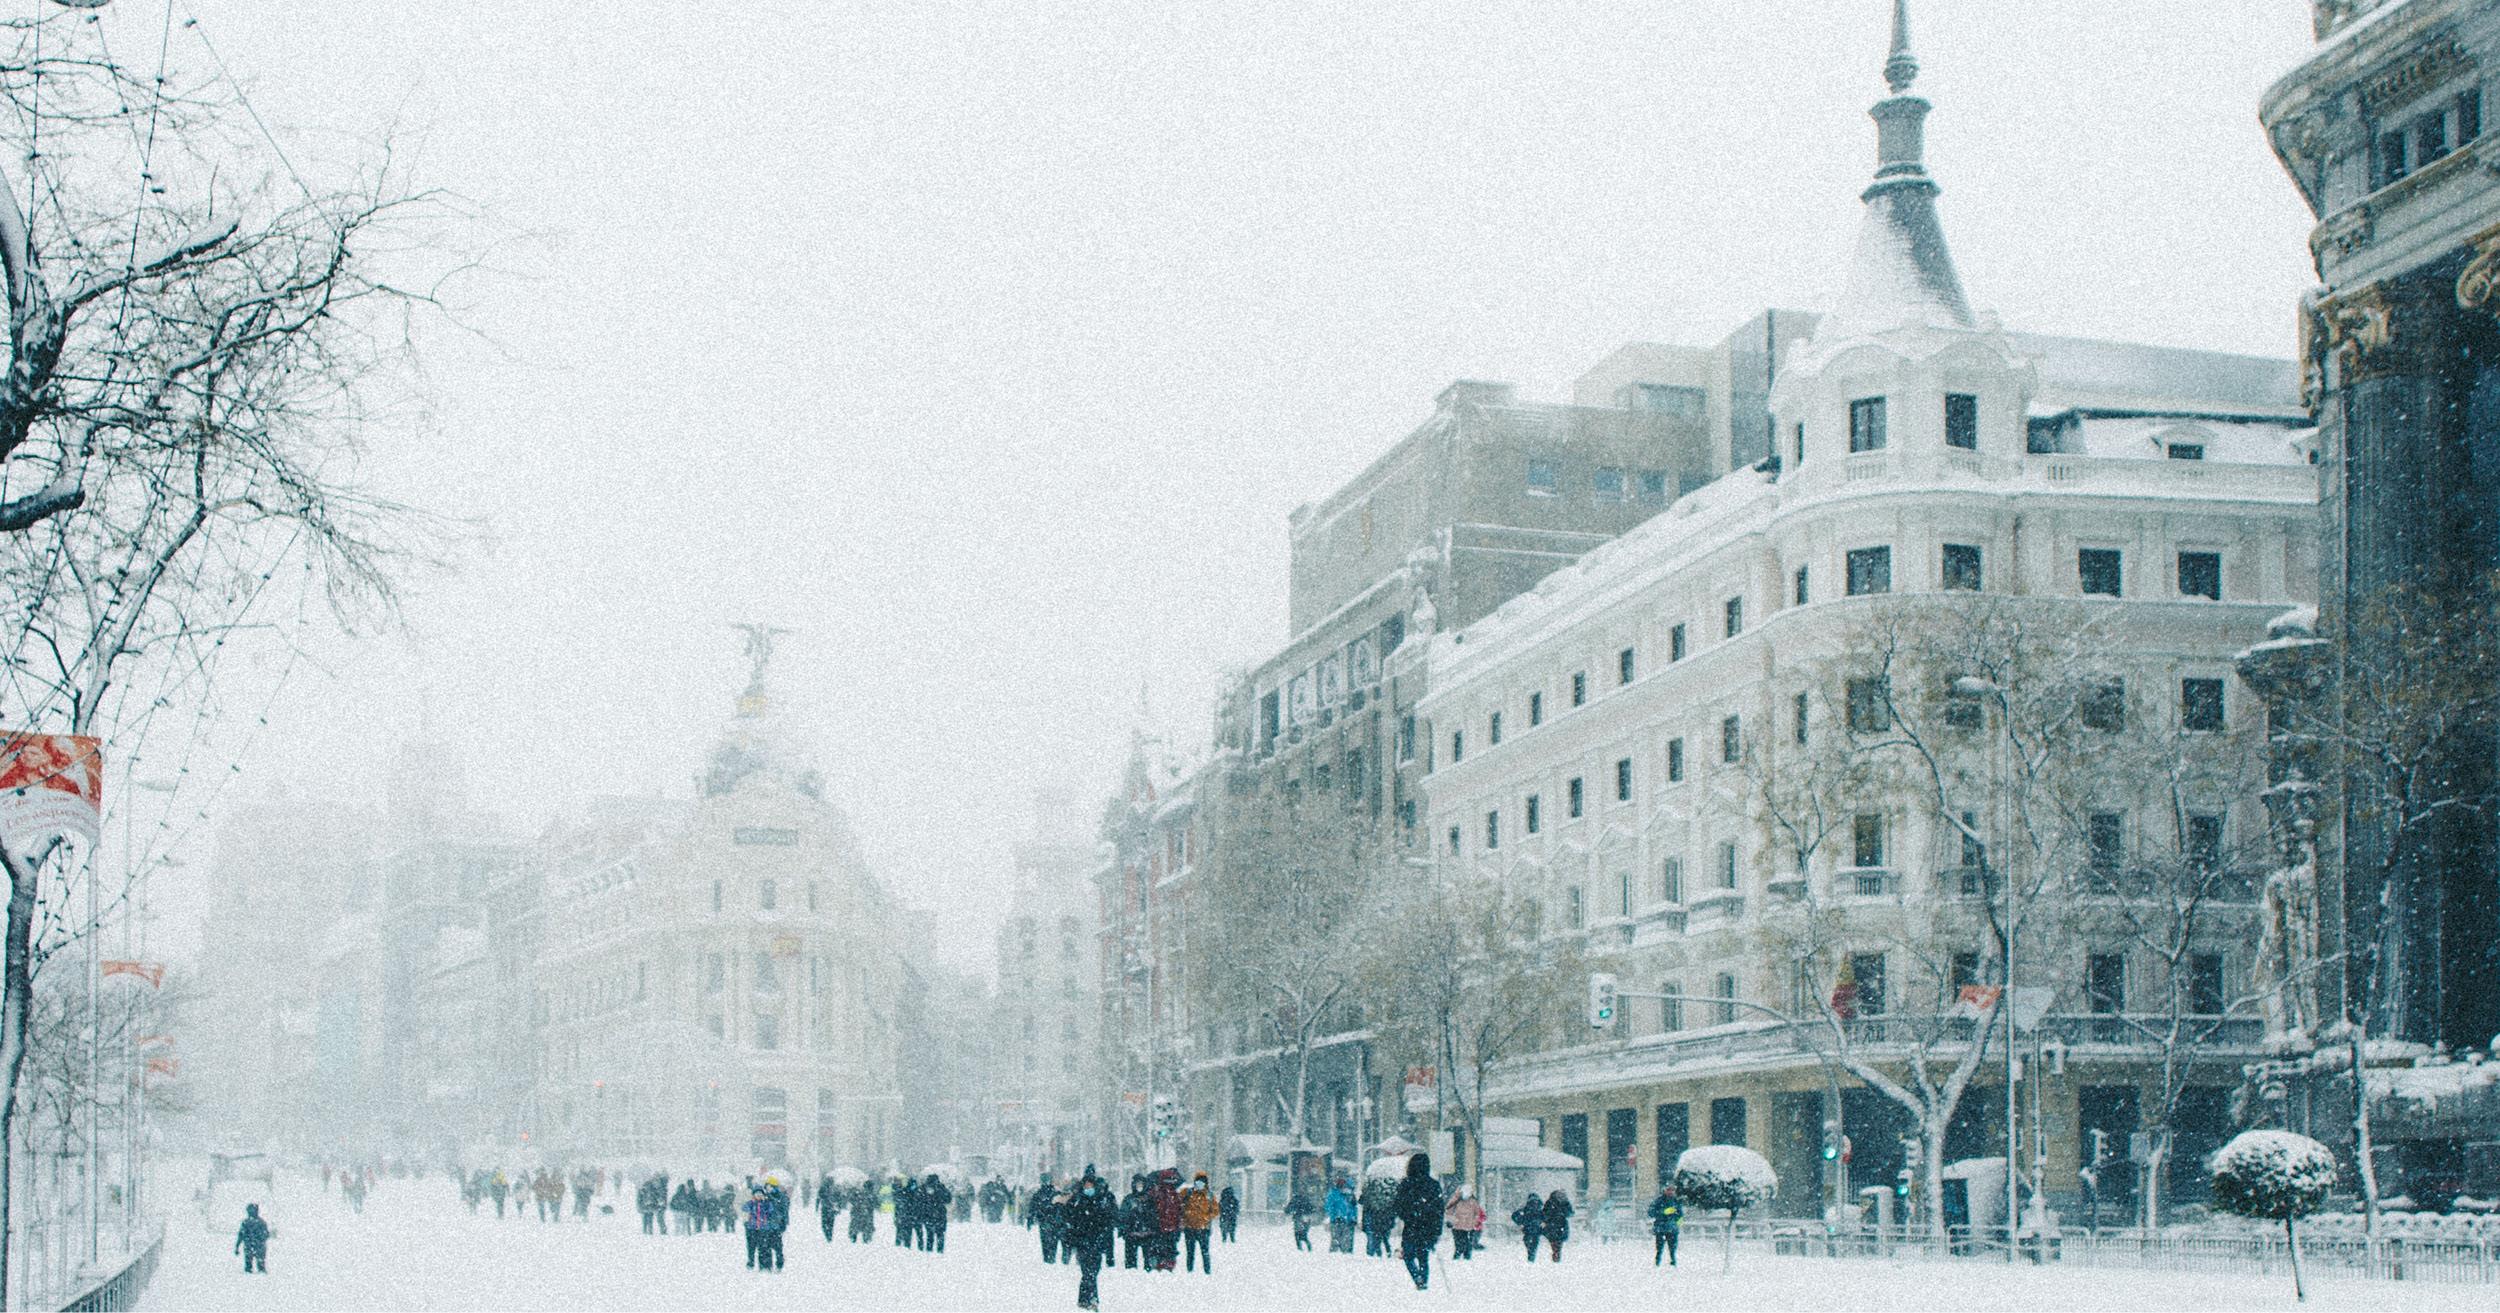 Ola de frío histórica